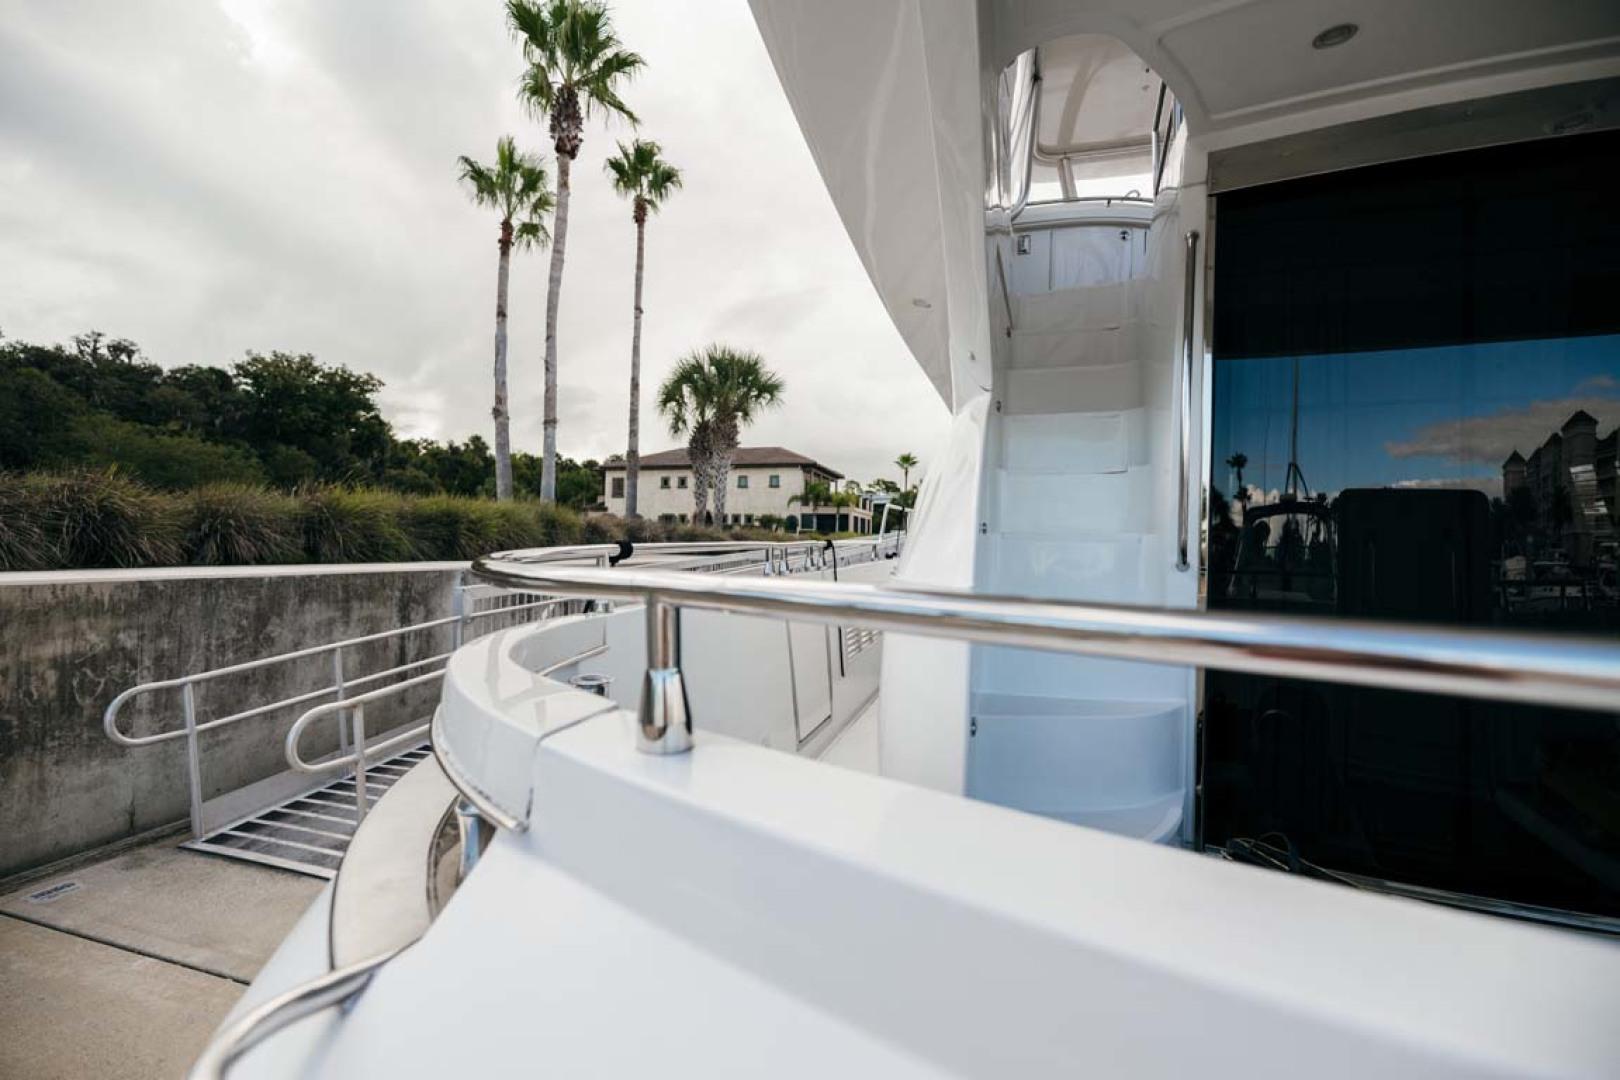 Marquis-Flybridge Motor Yacht 2004-Sandy Island Palm Coast-Florida-United States-Stairs to Flybridge-1247922 | Thumbnail